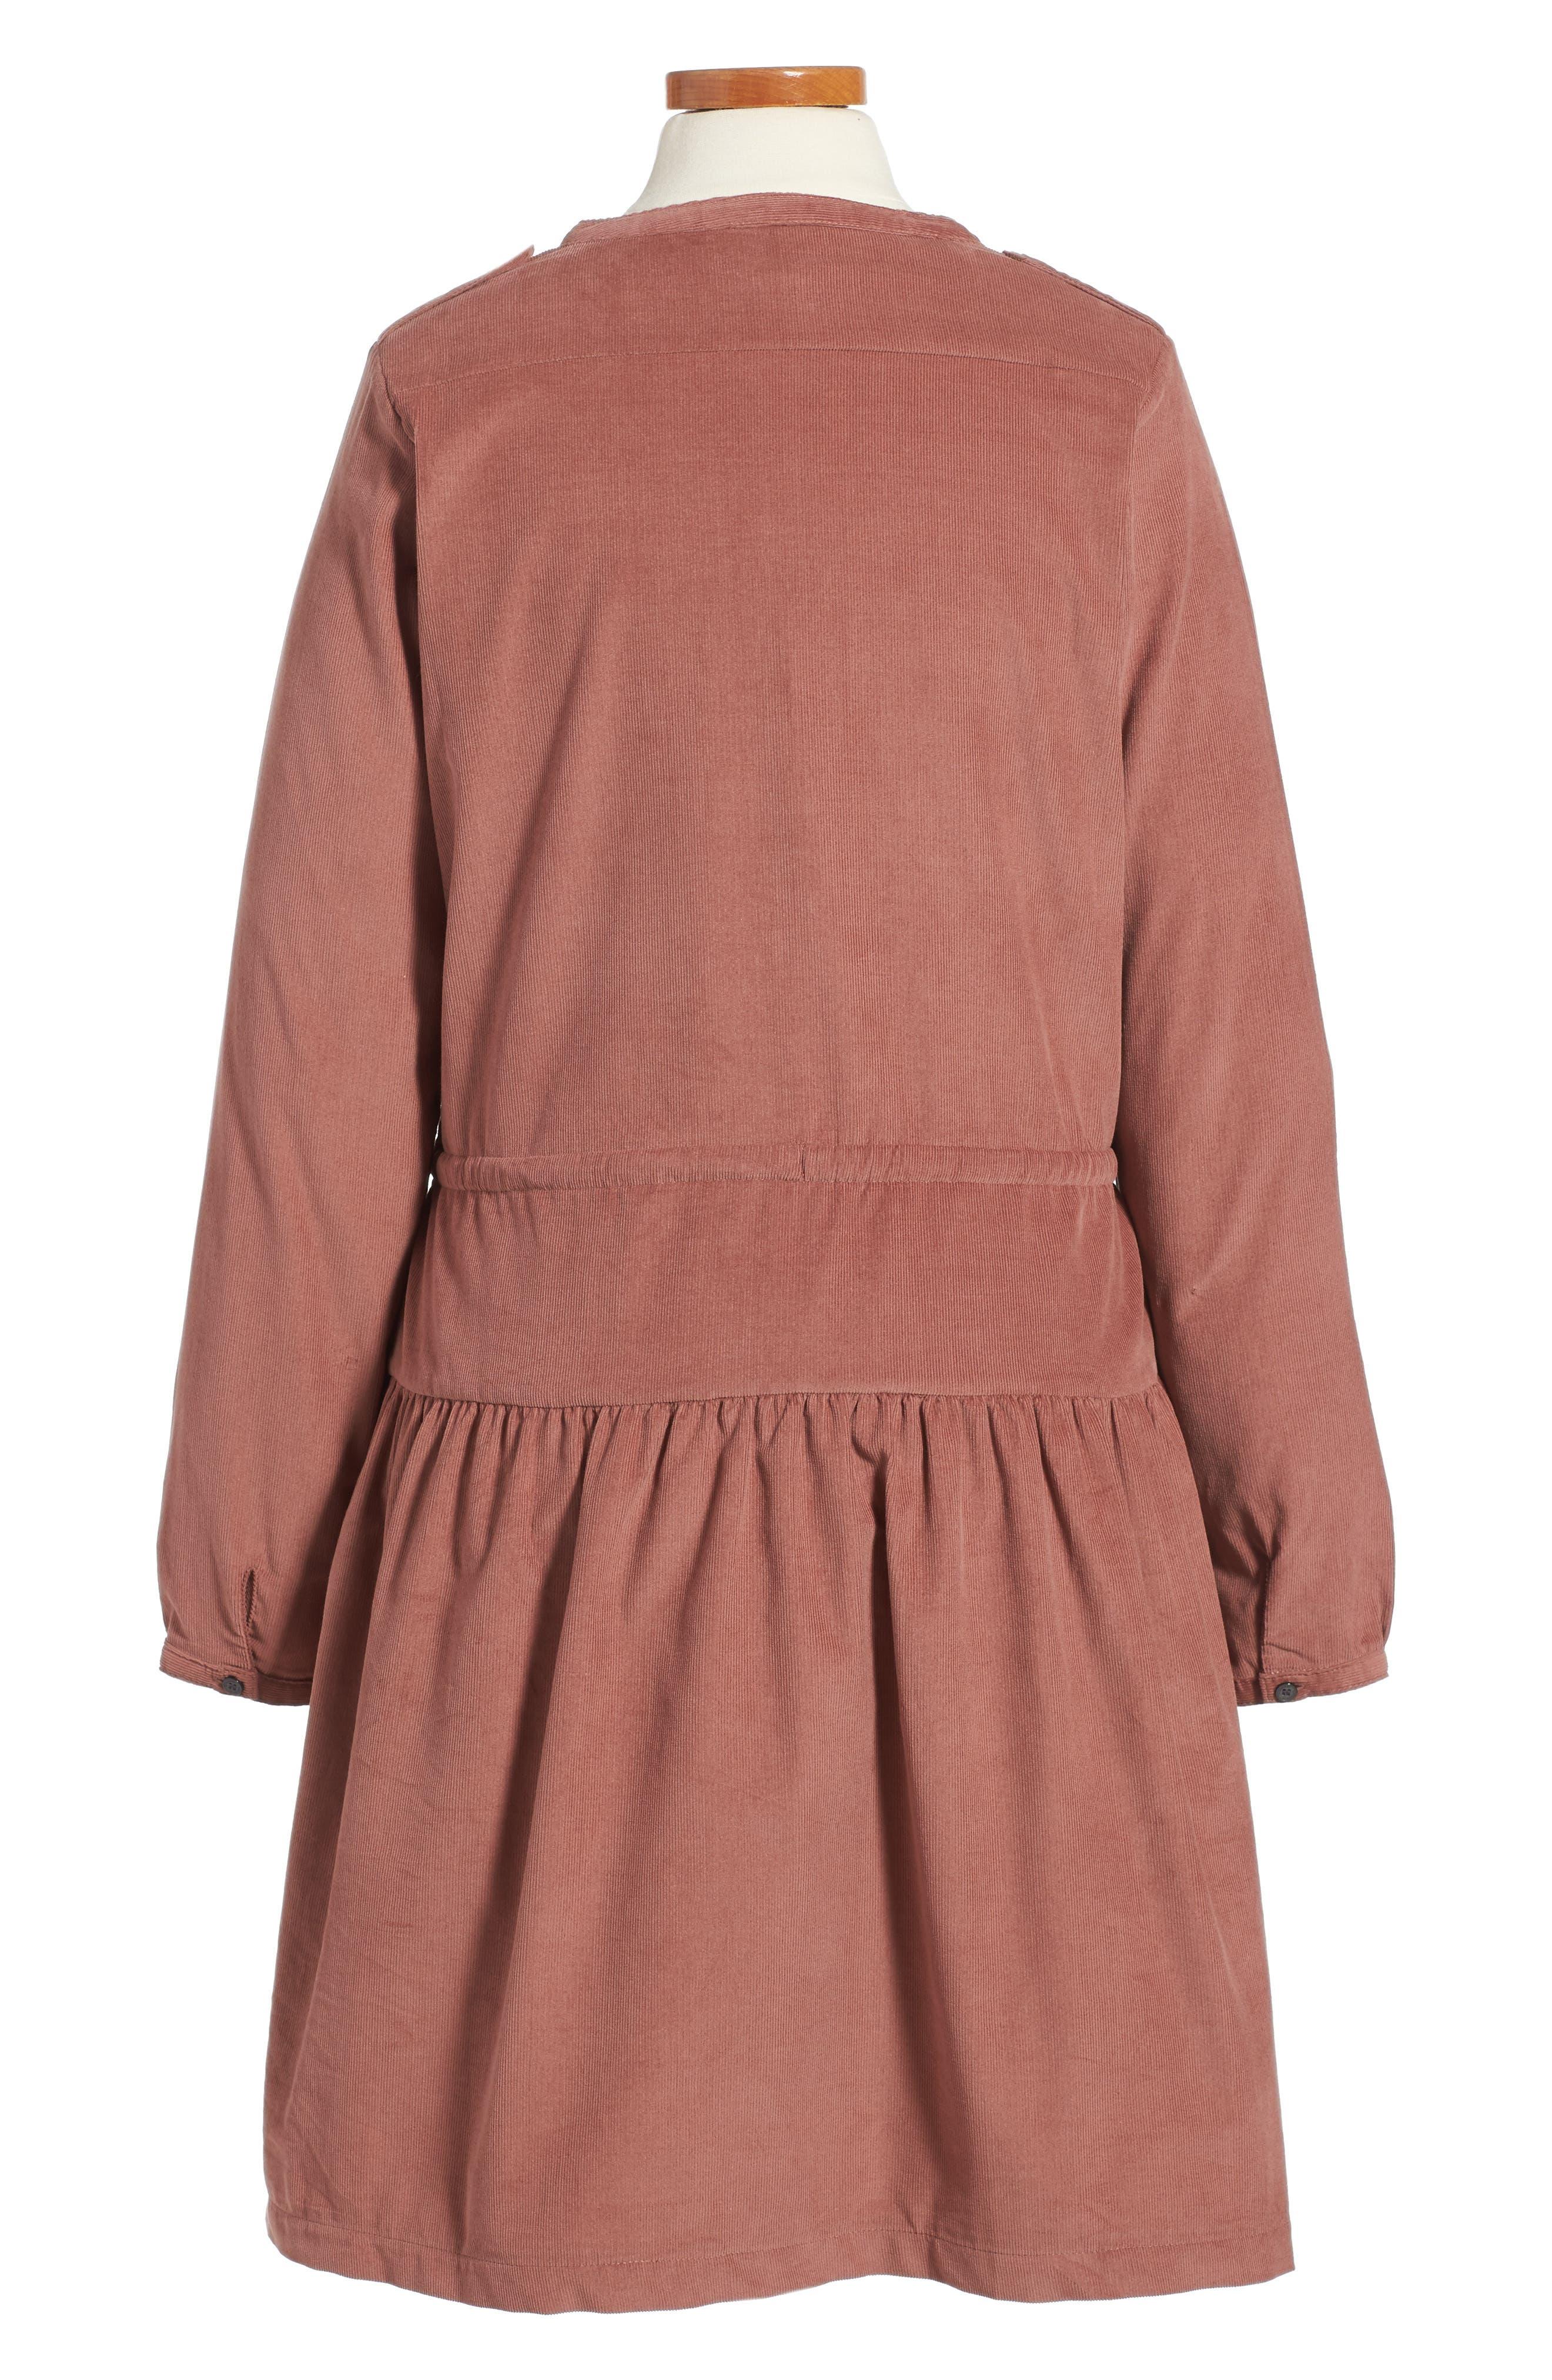 BURBERRY,                             Celestine Corduroy Dress,                             Alternate thumbnail 2, color,                             930